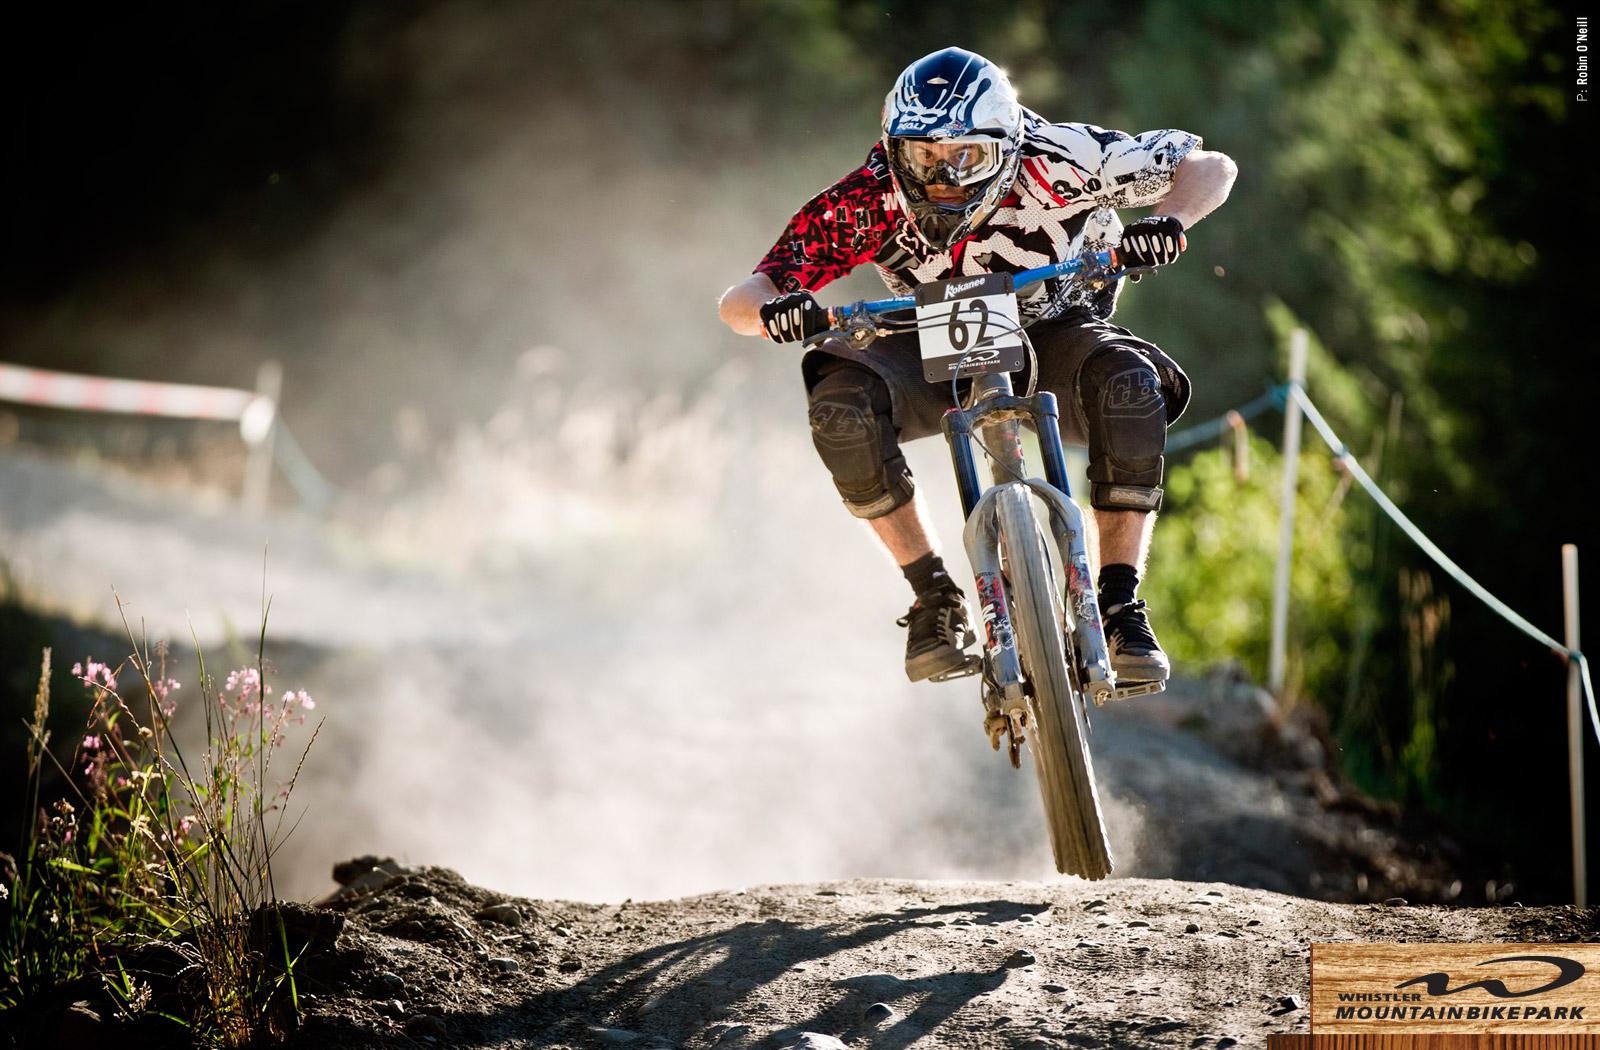 wallpaper bike sport downhill - photo #26